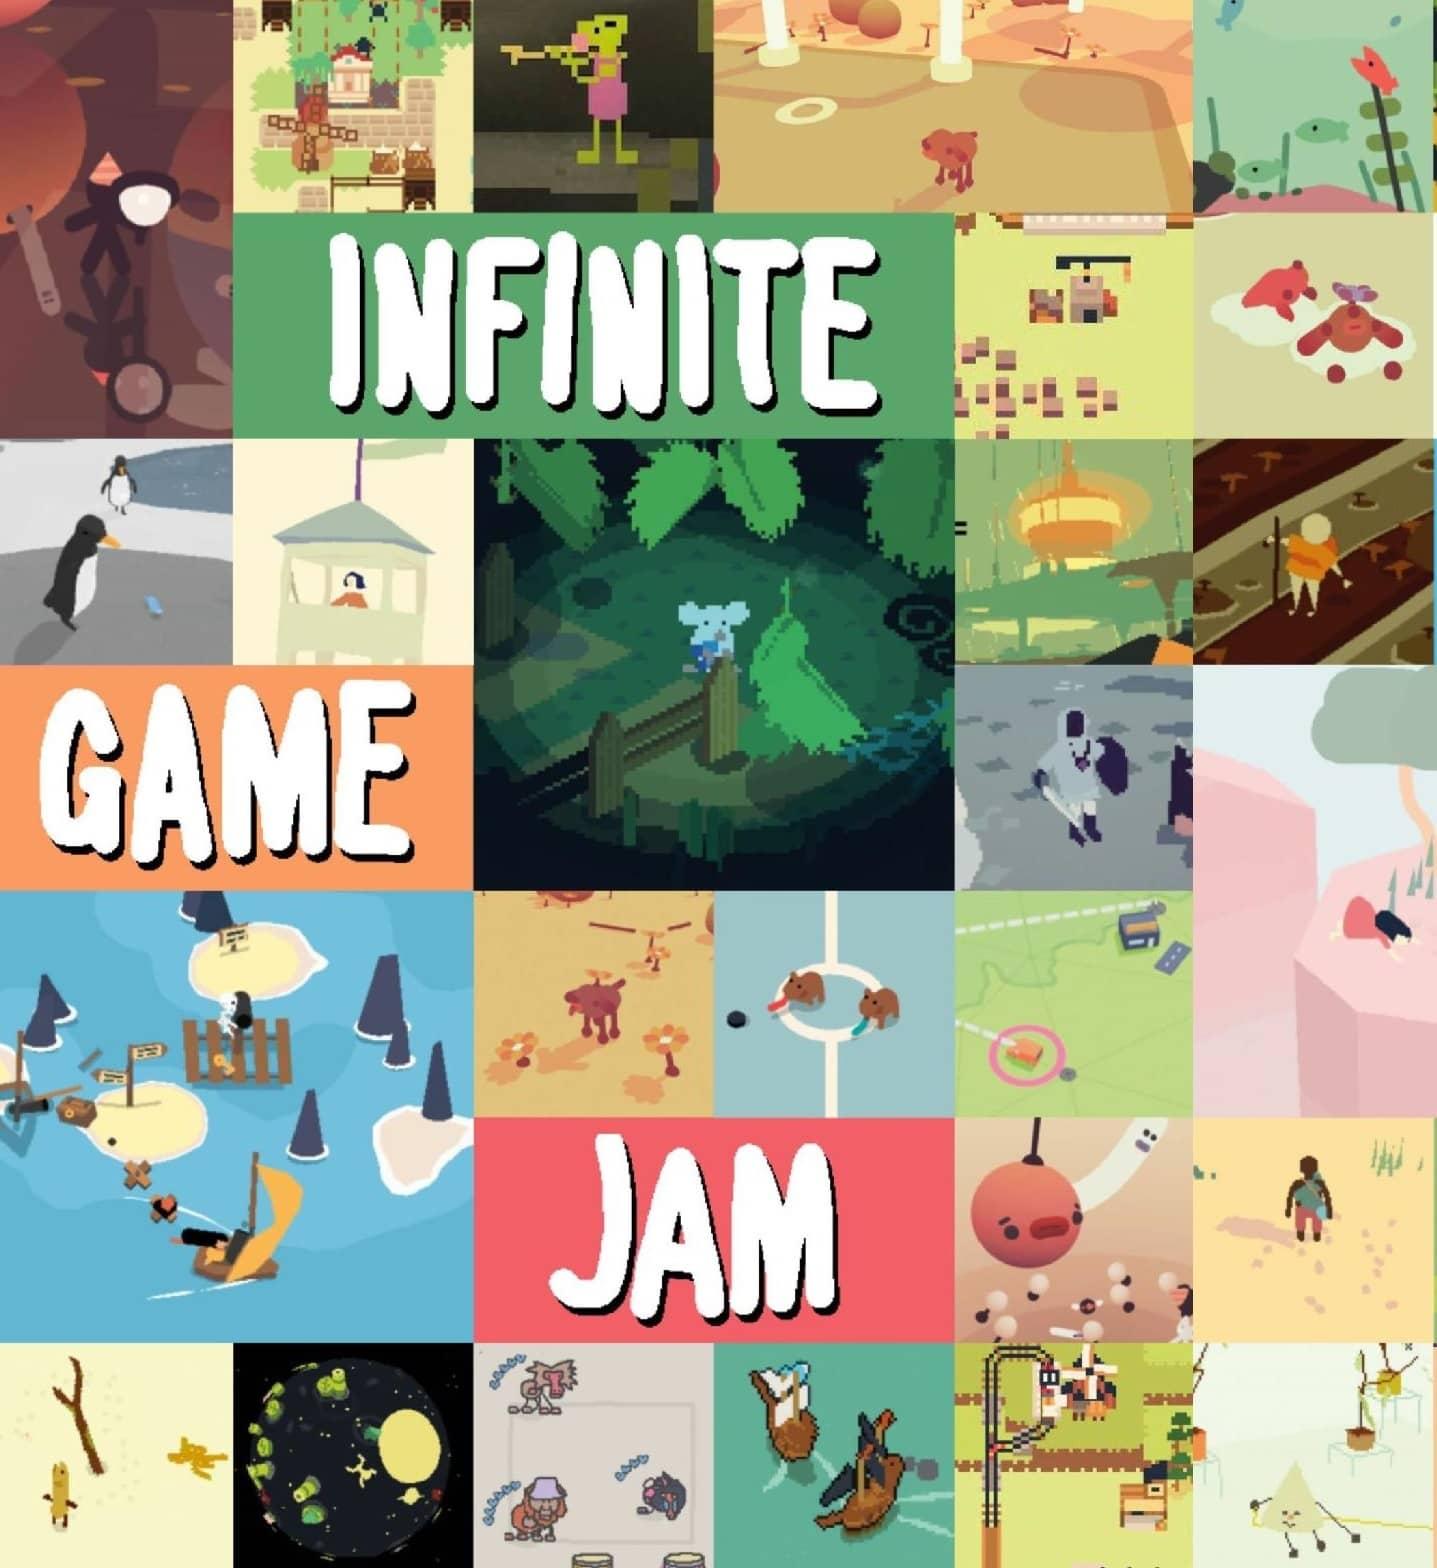 INFINITE GAME JAM